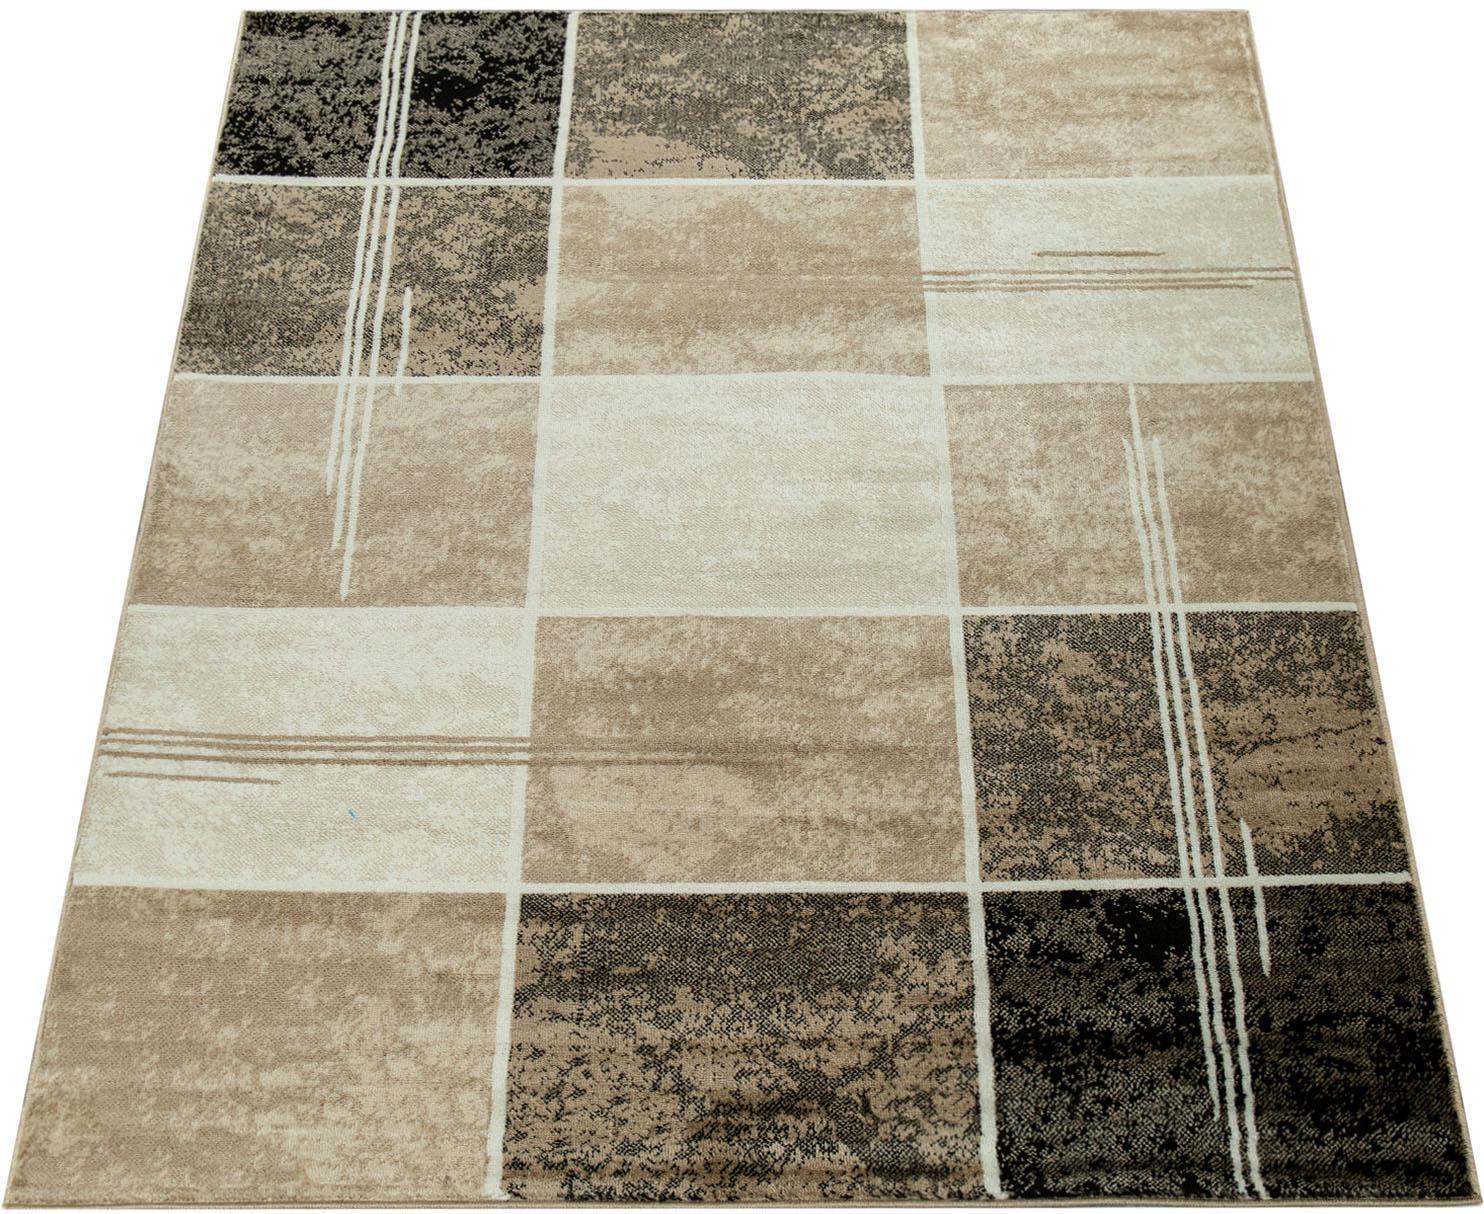 Teppich Sinai 057 Paco Home rechteckig Höhe 13 mm